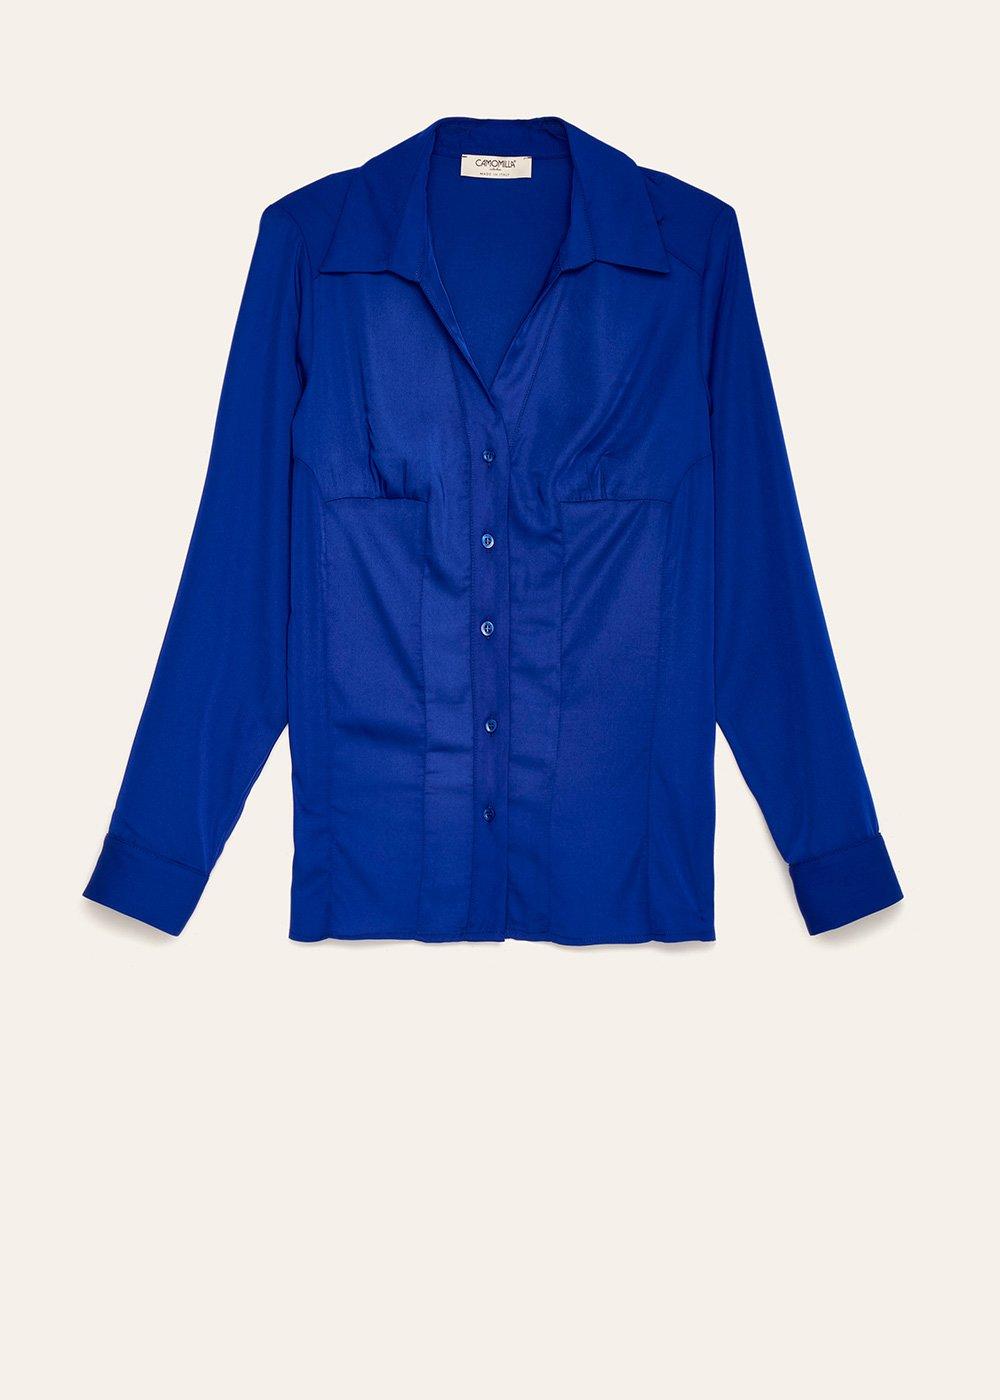 Scarlett satin-like shirt - Abisso - Woman